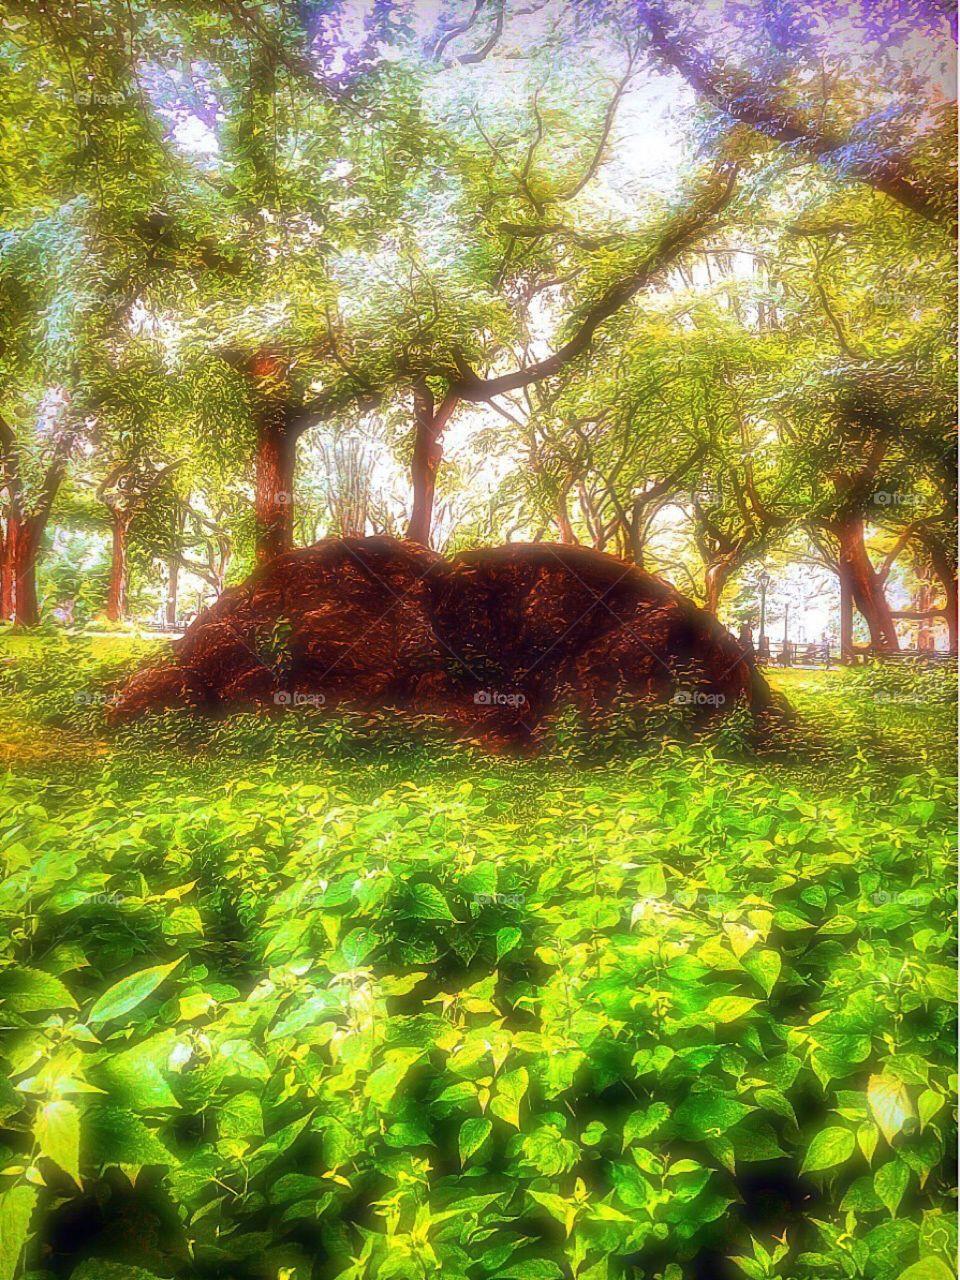 Nature/Landscape, 307th  Infantry Memorial Grove, Central Park, Manhattan, New York City. Instagram,@PennyPeronto